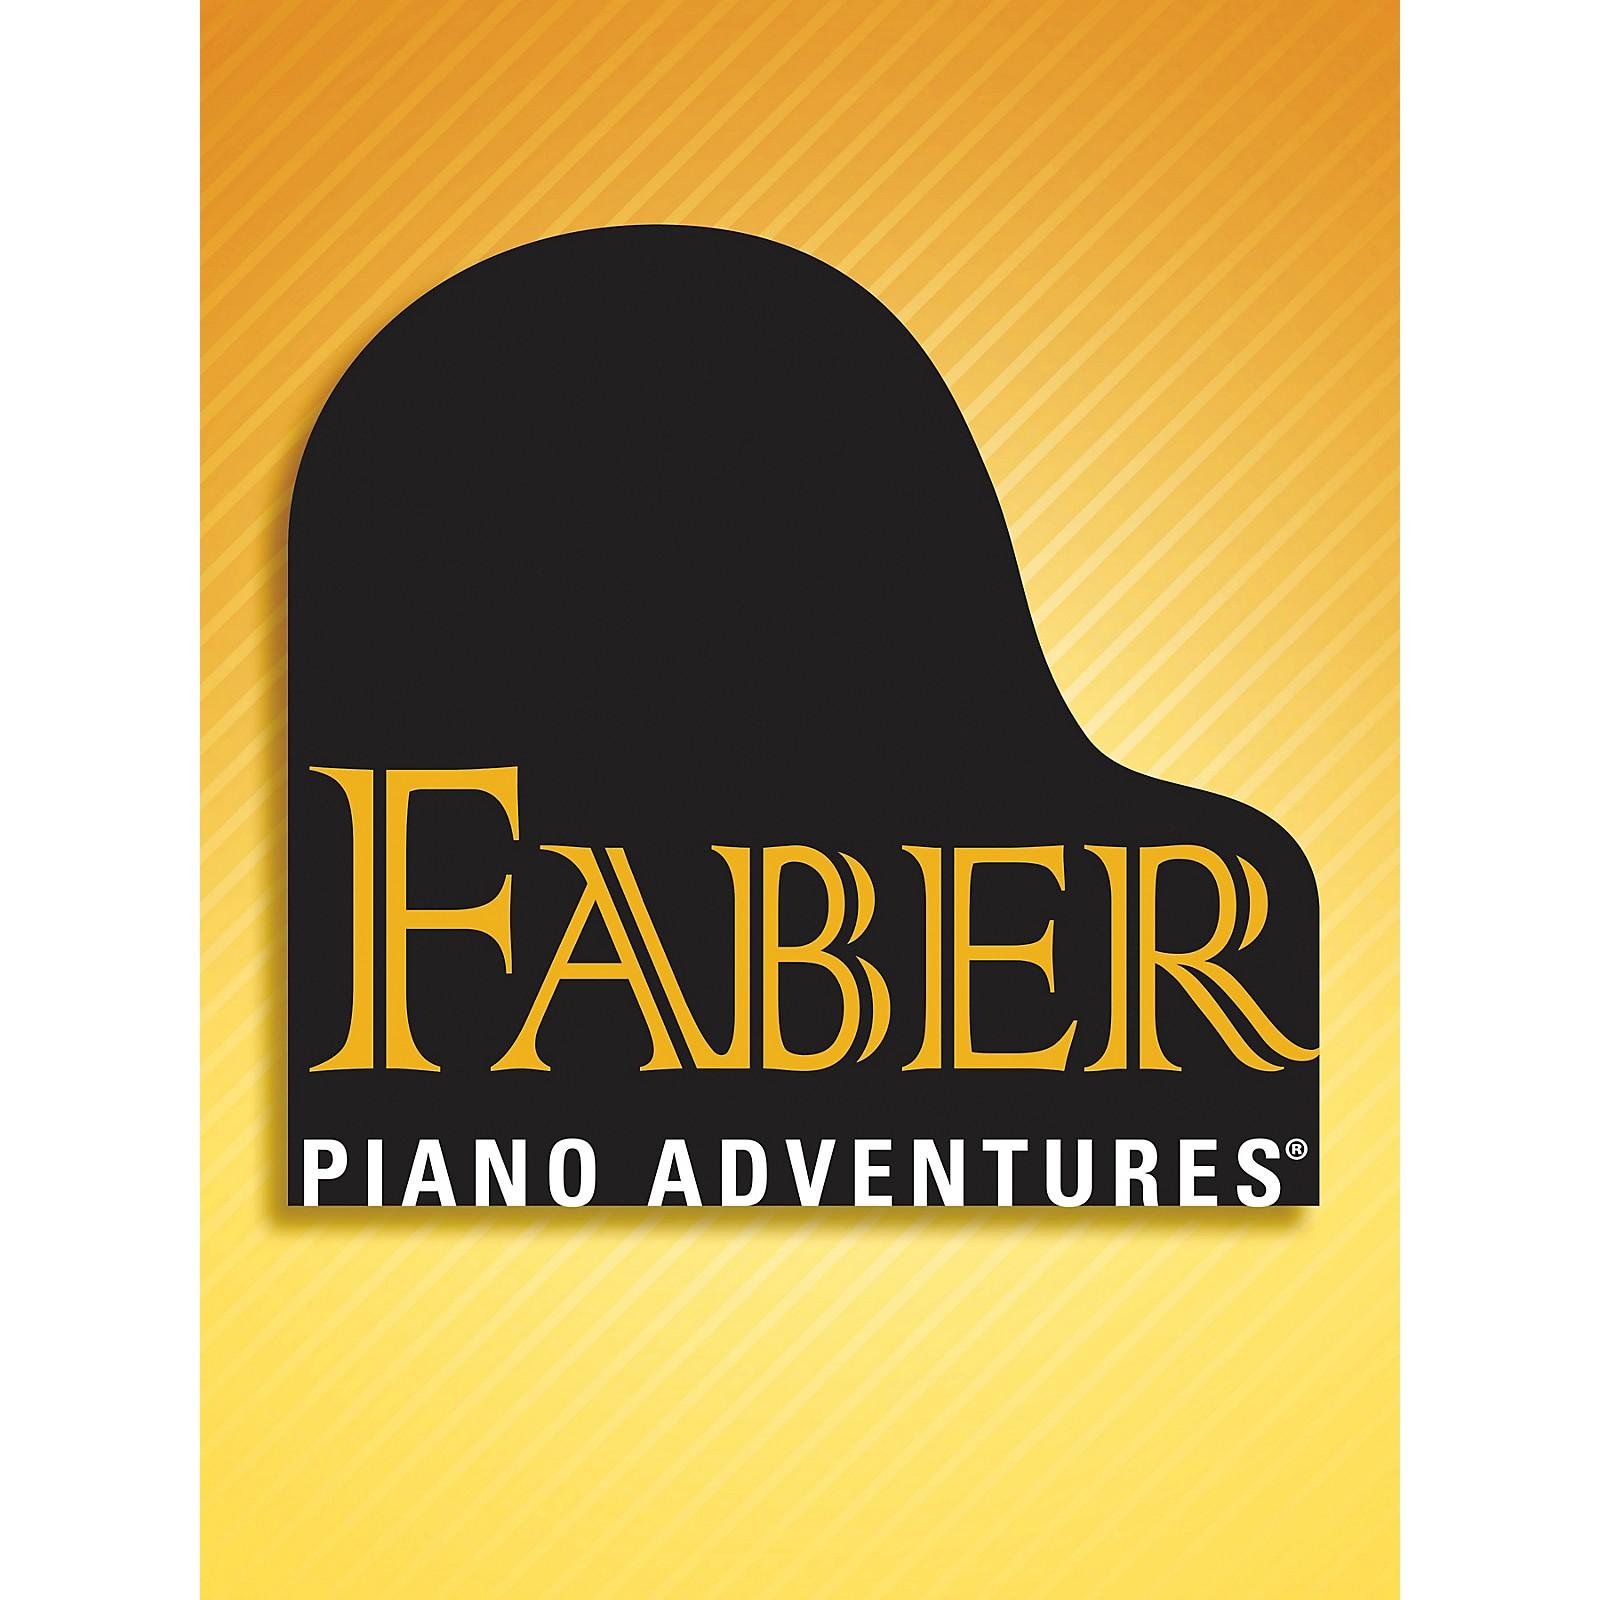 Faber Piano Adventures Level 5 - Popular Repertoire CD (2 CDs) Faber Piano Adventures® Series CD by Nancy Faber